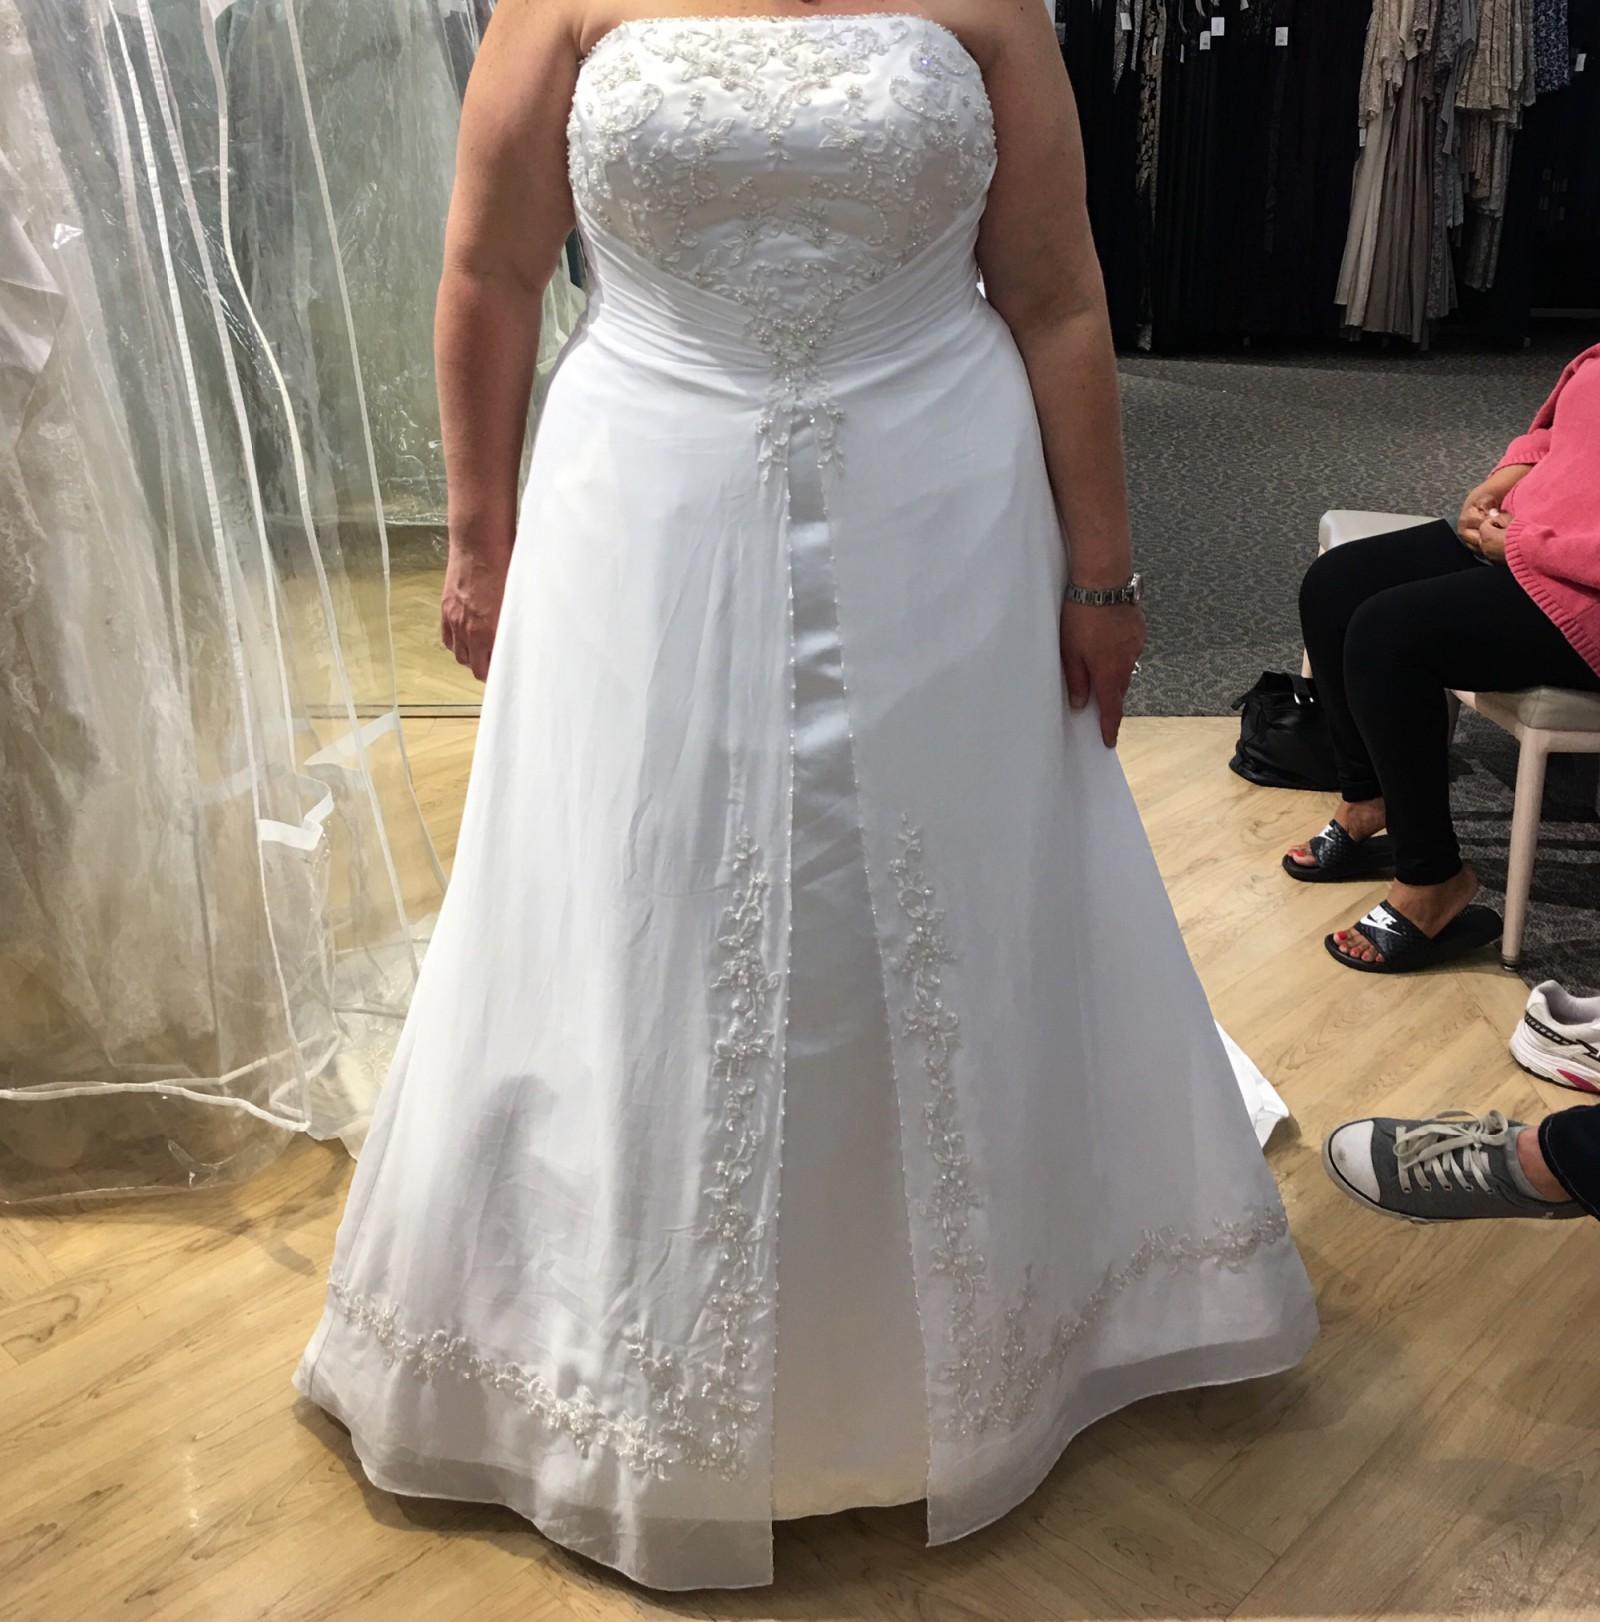 David Bridal Bridesmaid Dresses Plus Size: David's Bridal New Wedding Dress On Sale 23% Off